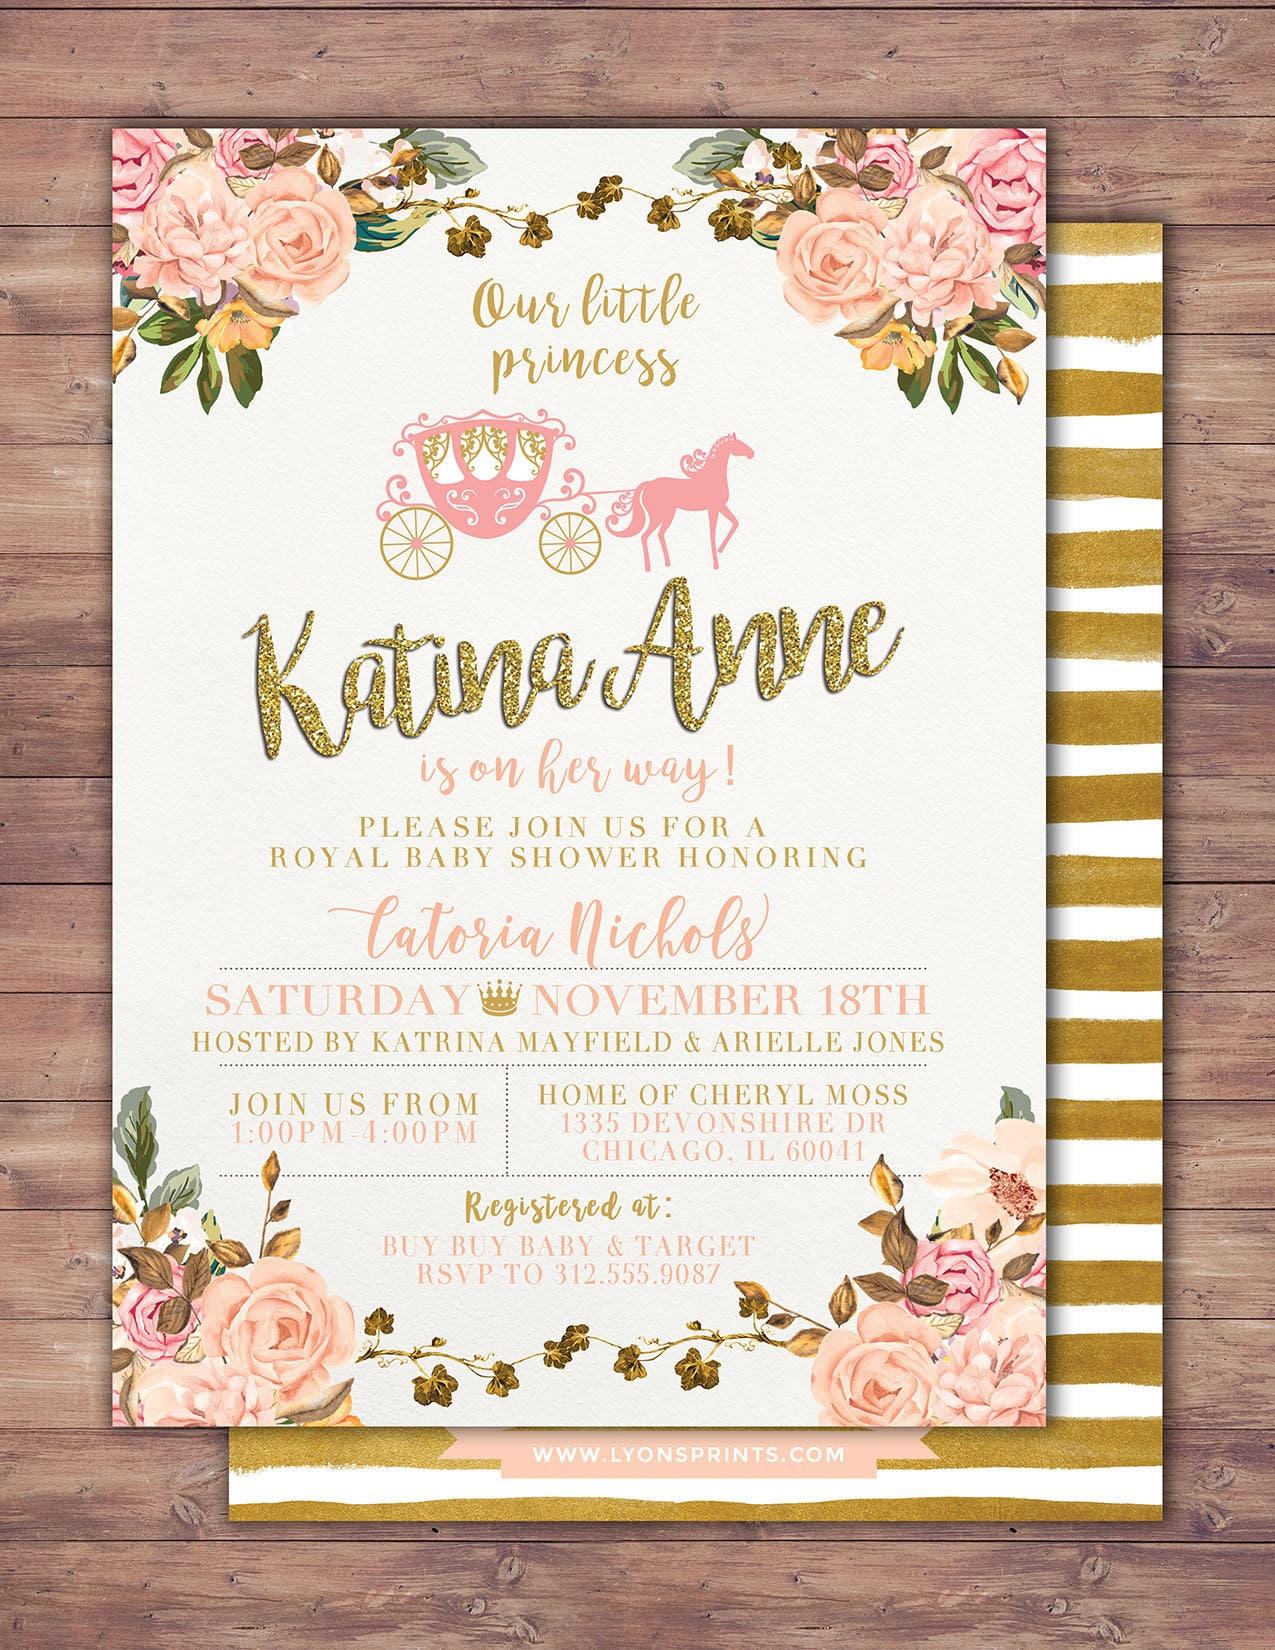 Princess baby shower invitation princess carriage baby shower princess baby shower invite carriage invitation gallery photo gallery photo filmwisefo